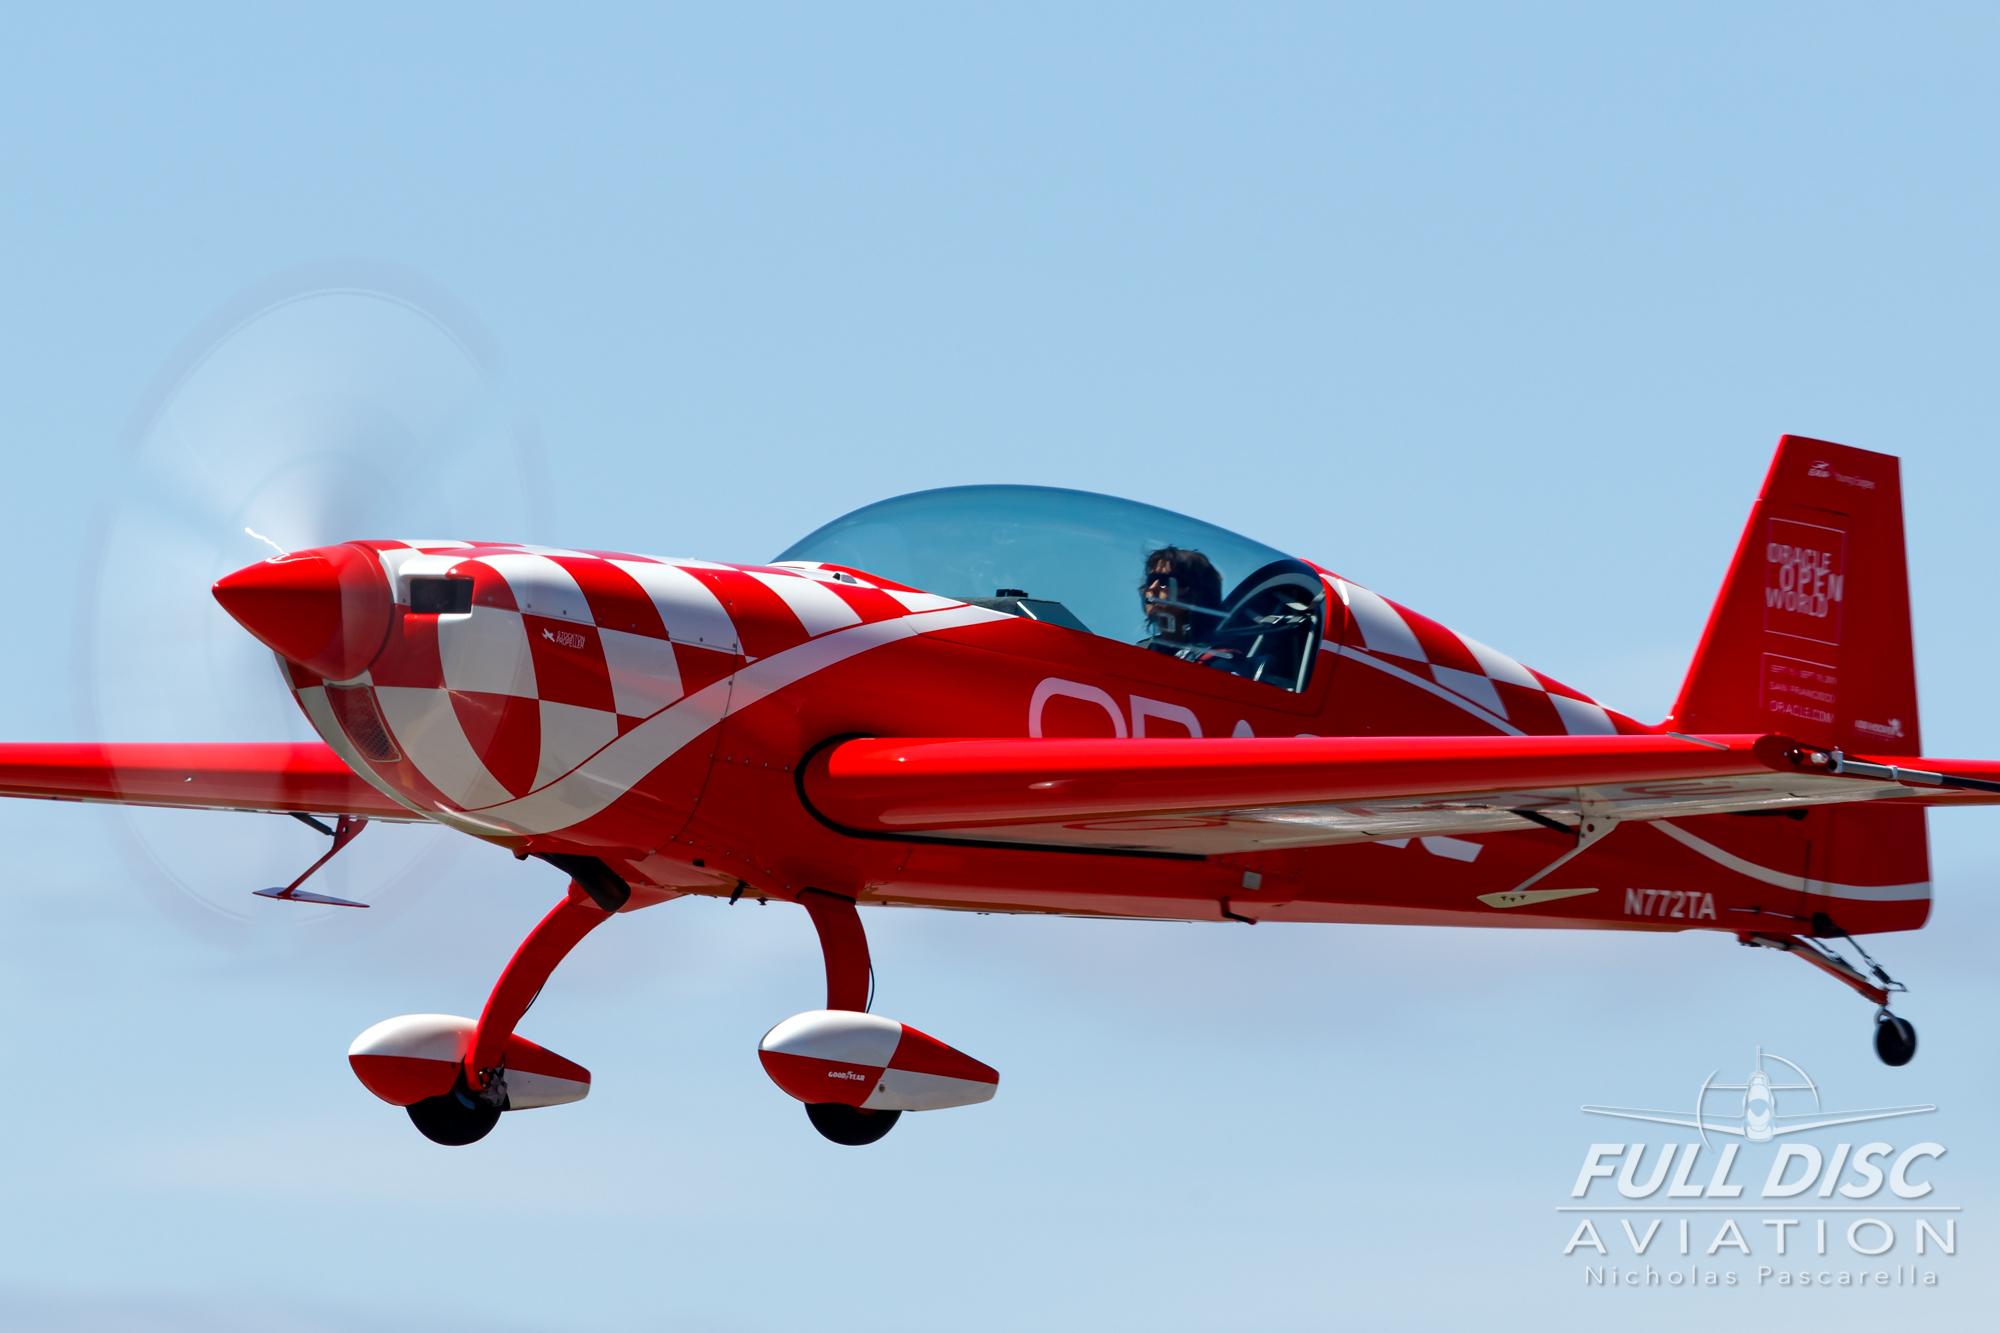 americanairpowermuseum_nicholaspascarella_nickpascarella_fulldiscaviation_legendsofairpower2019_aviation_warbird_oracle_stuntplane_landing.jpg